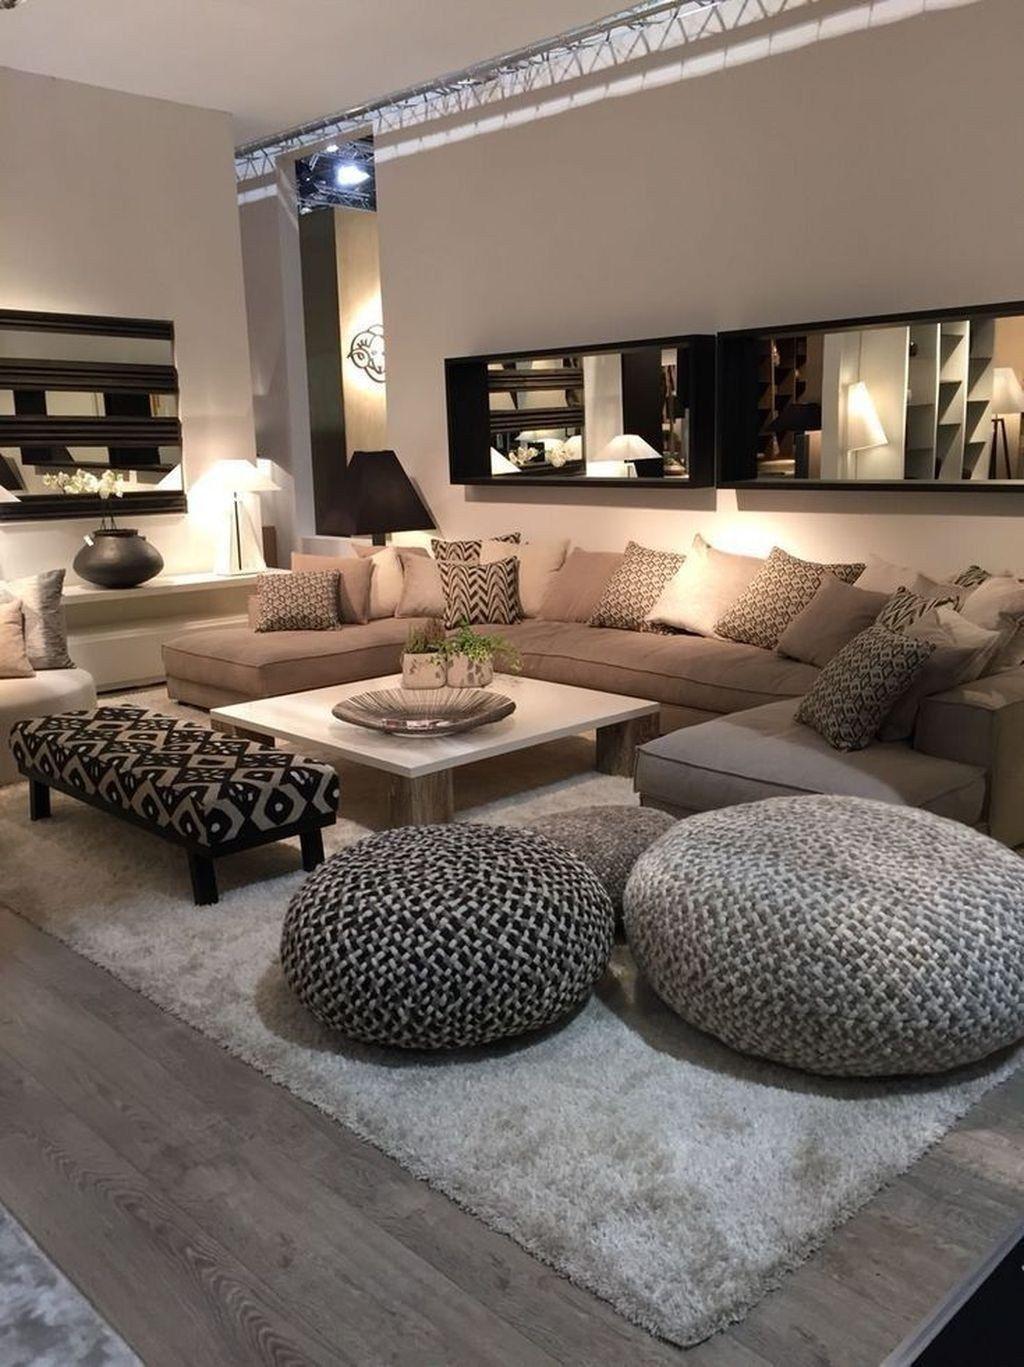 20 Modern Apartment Interior Design Ideas Small Living Room Decor Luxury Living Room Luxury Home Decor